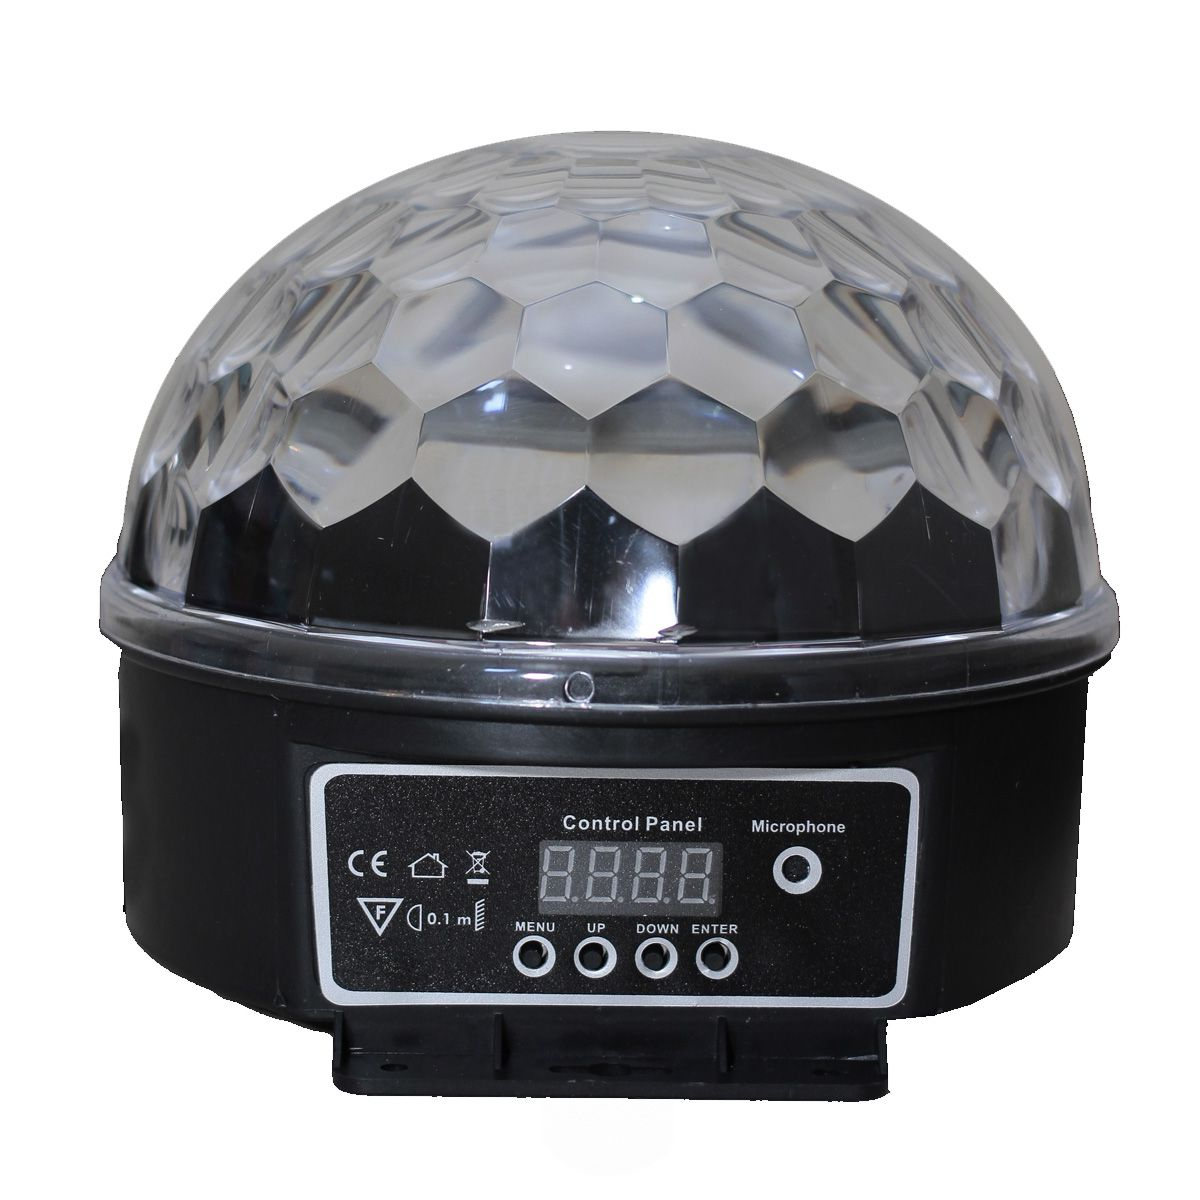 Strobo Meia Lua SP14 6 Canais DMX LED RGB Spectrum